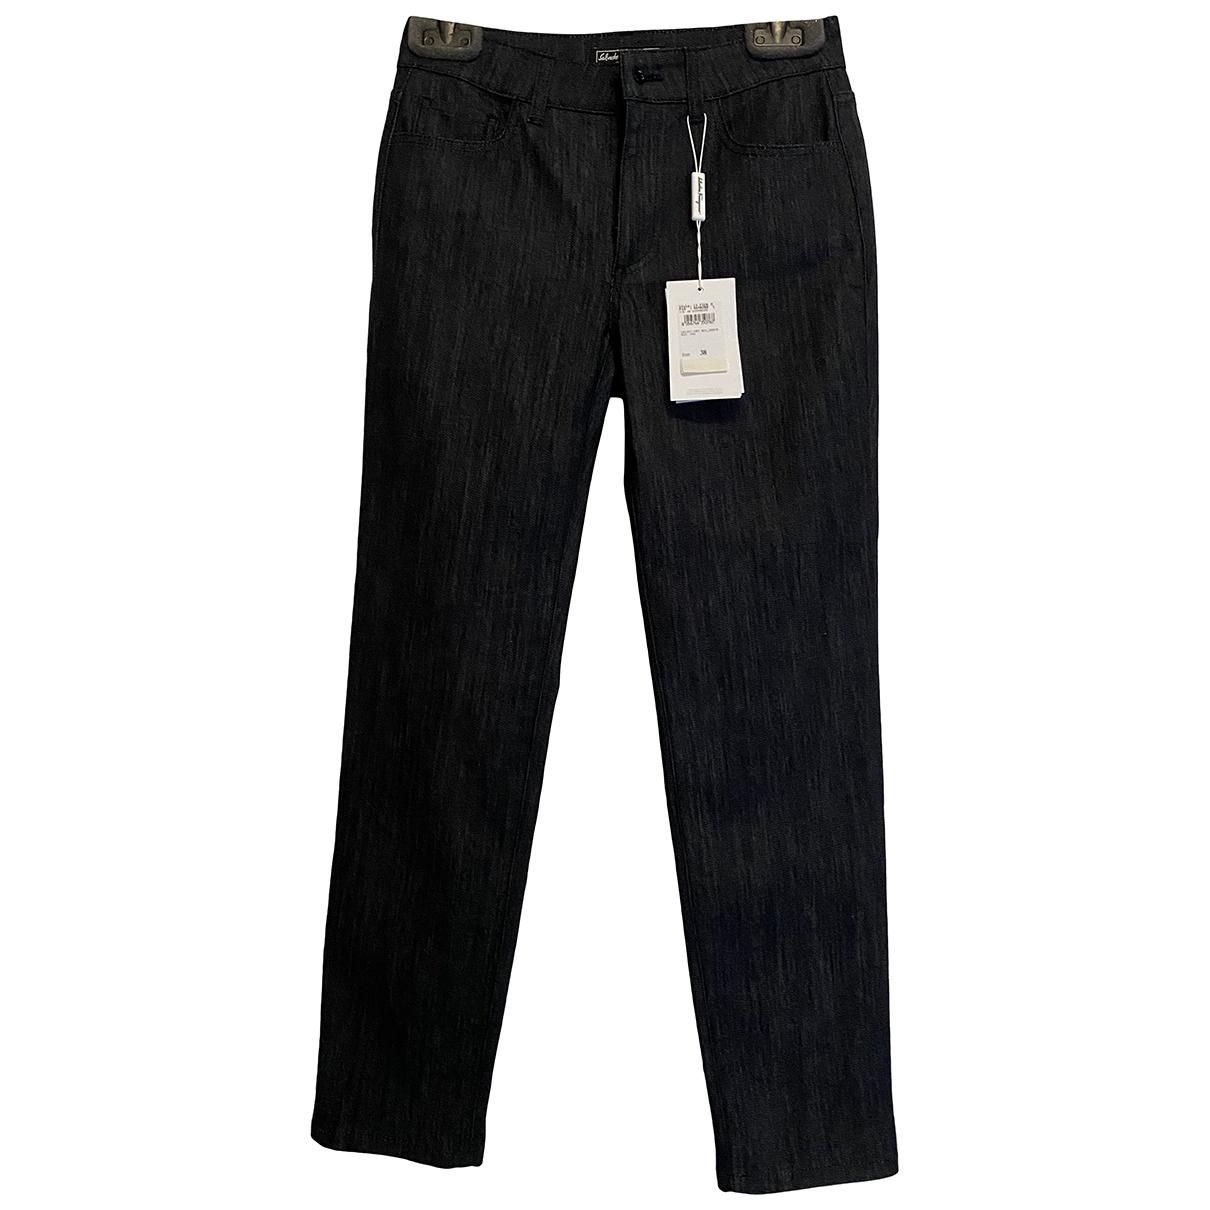 Salvatore Ferragamo \N Blue Cotton - elasthane Jeans for Women 36 FR